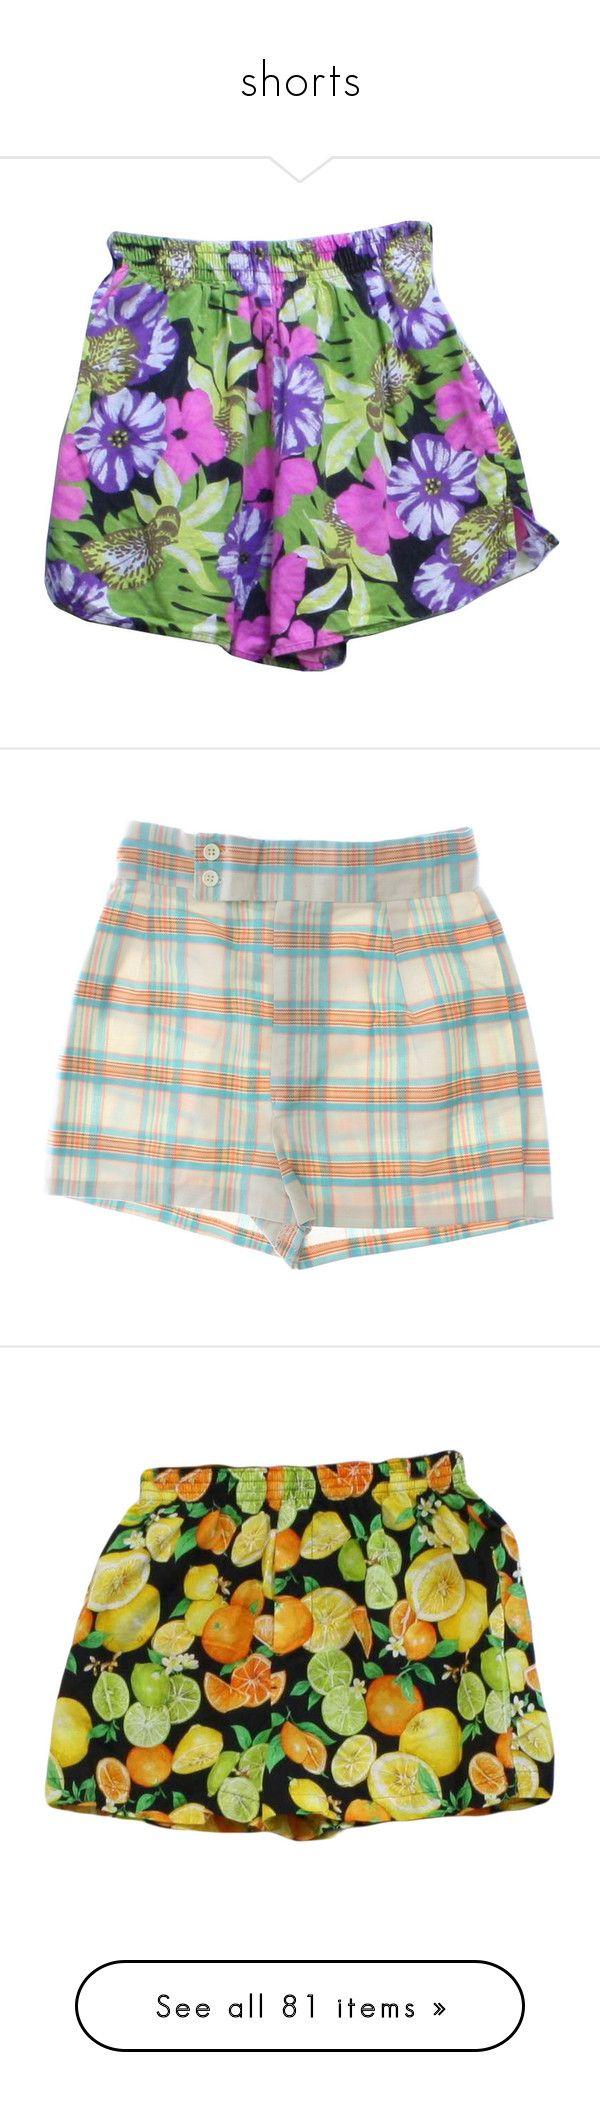 """shorts"" by crybabying ❤ liked on Polyvore featuring swimwear, bikinis, bikini bottoms, shorts, bottoms, pants, clothes - shorts, pink swimsuit, retro bikini and white bikini bottoms"